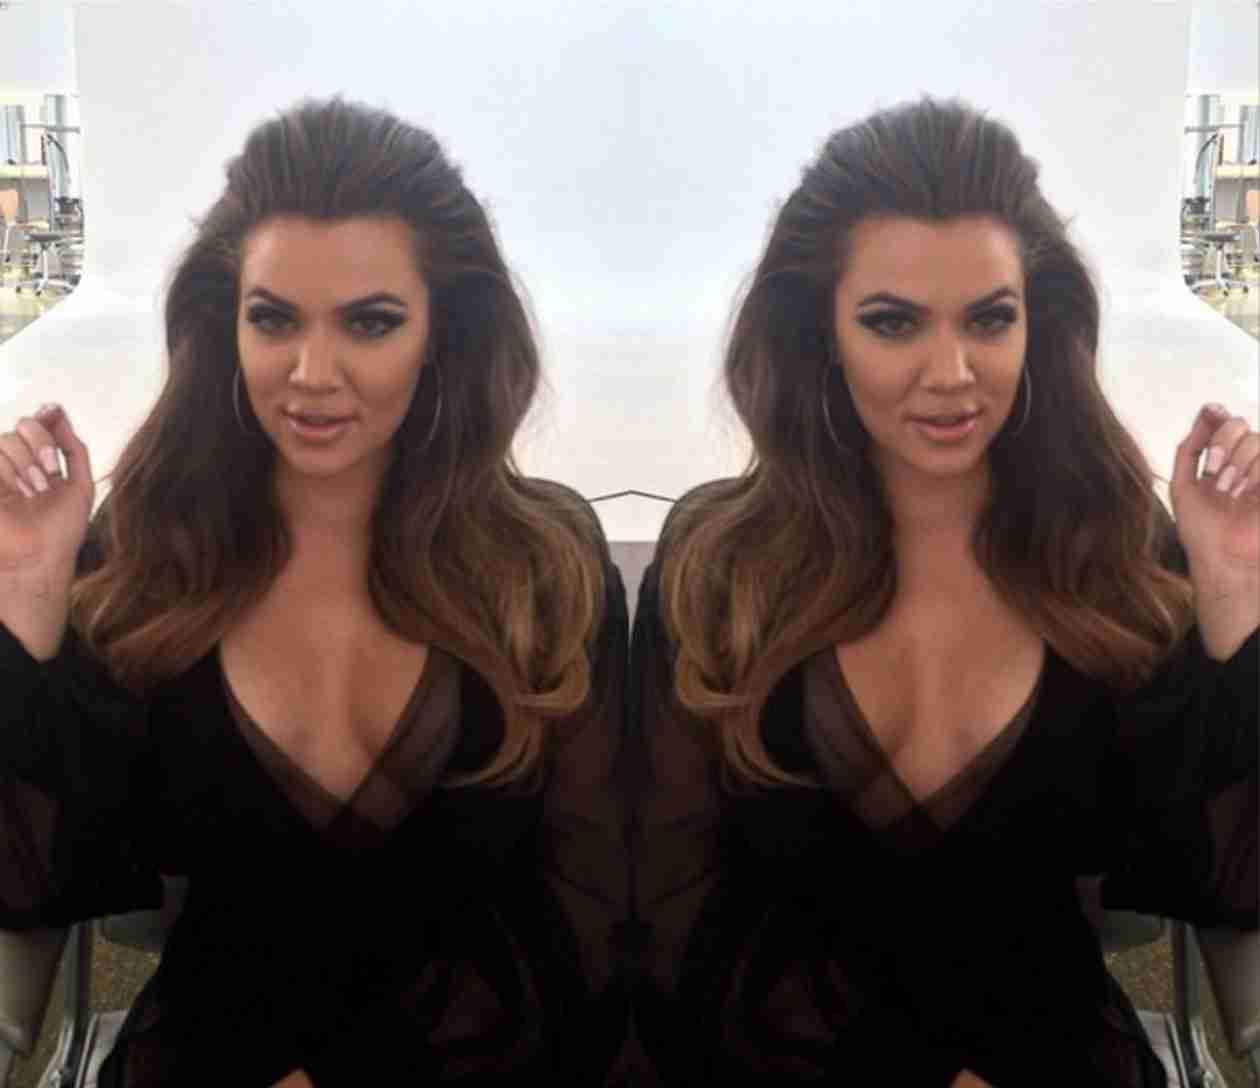 Khloe Kardashian Goes Back to Brunette!